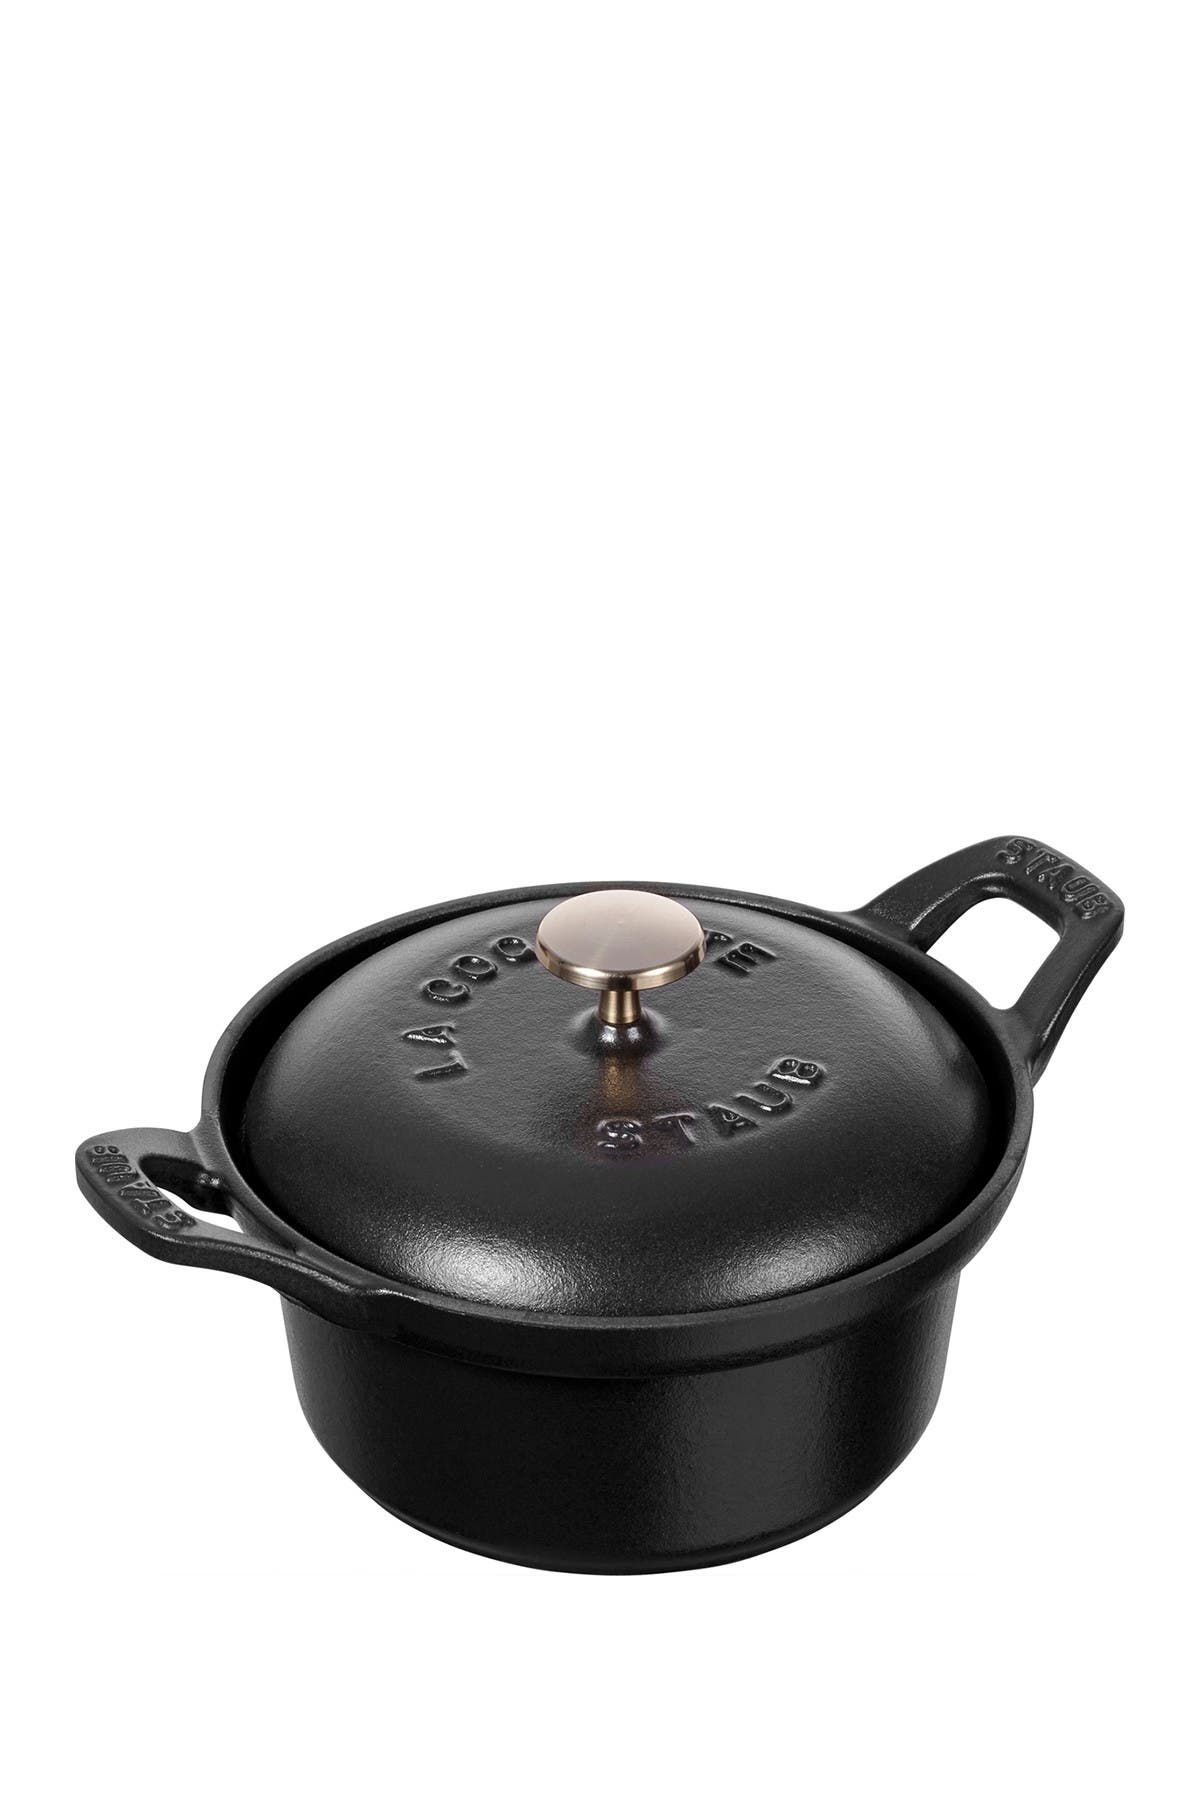 Image of Staub Cast Iron 0.5-qt Round Cocotte - Black